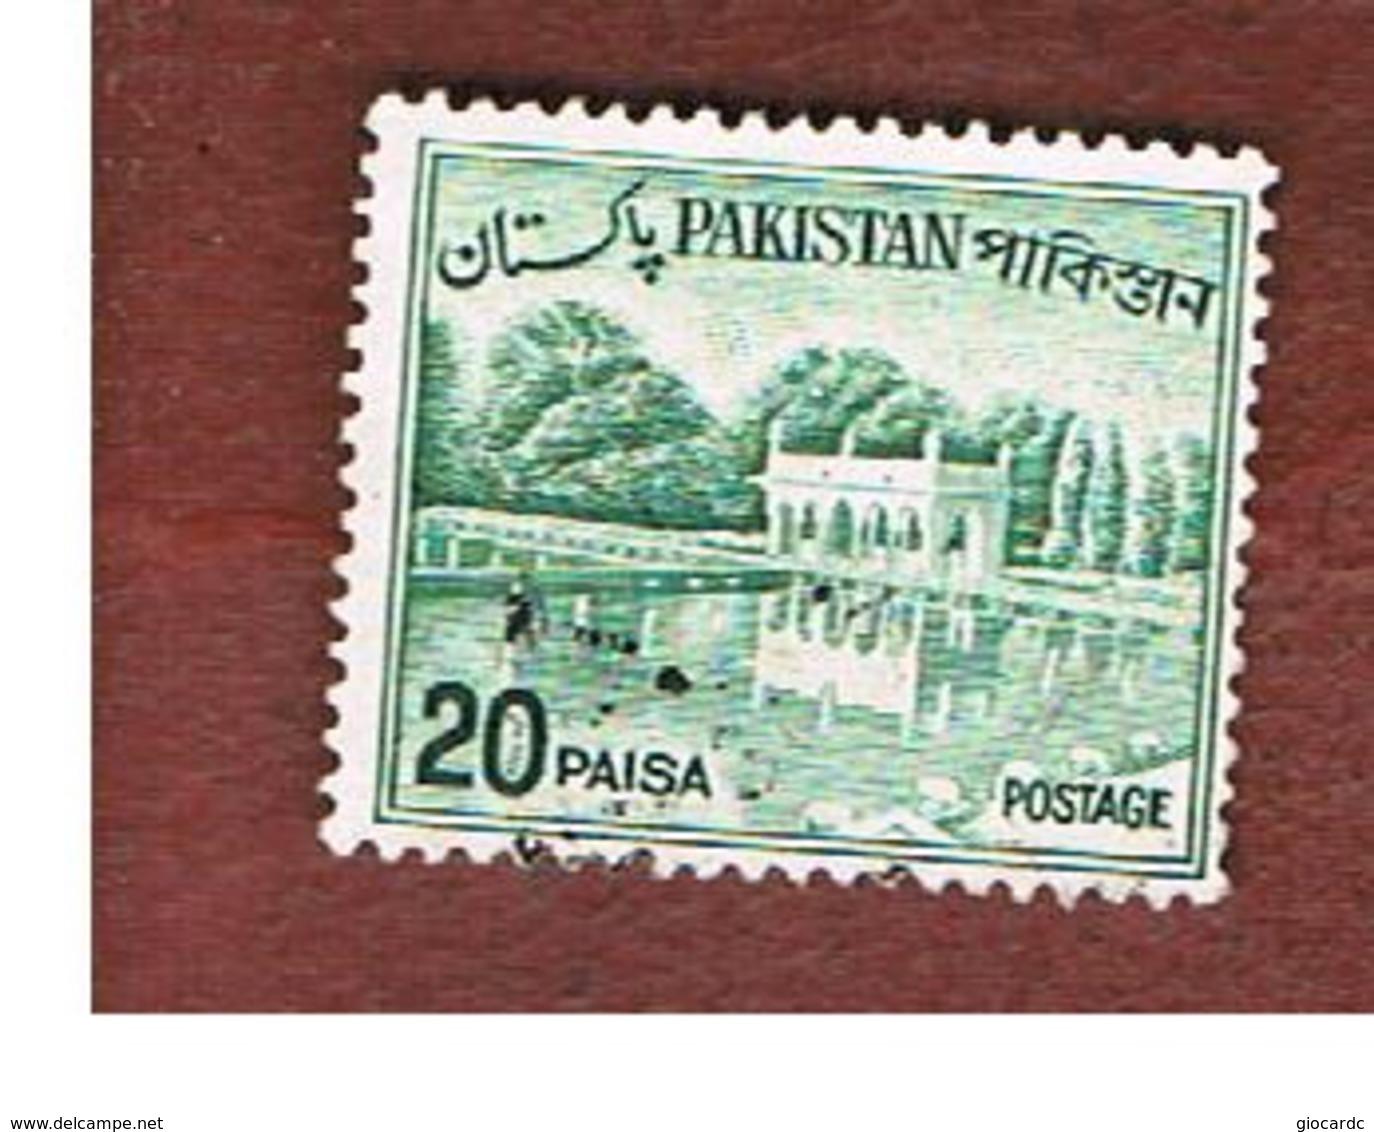 PAKISTAN  -  SG 176b  -  1970  SHALIMAR GARDENS   -  USED ° - Pakistan